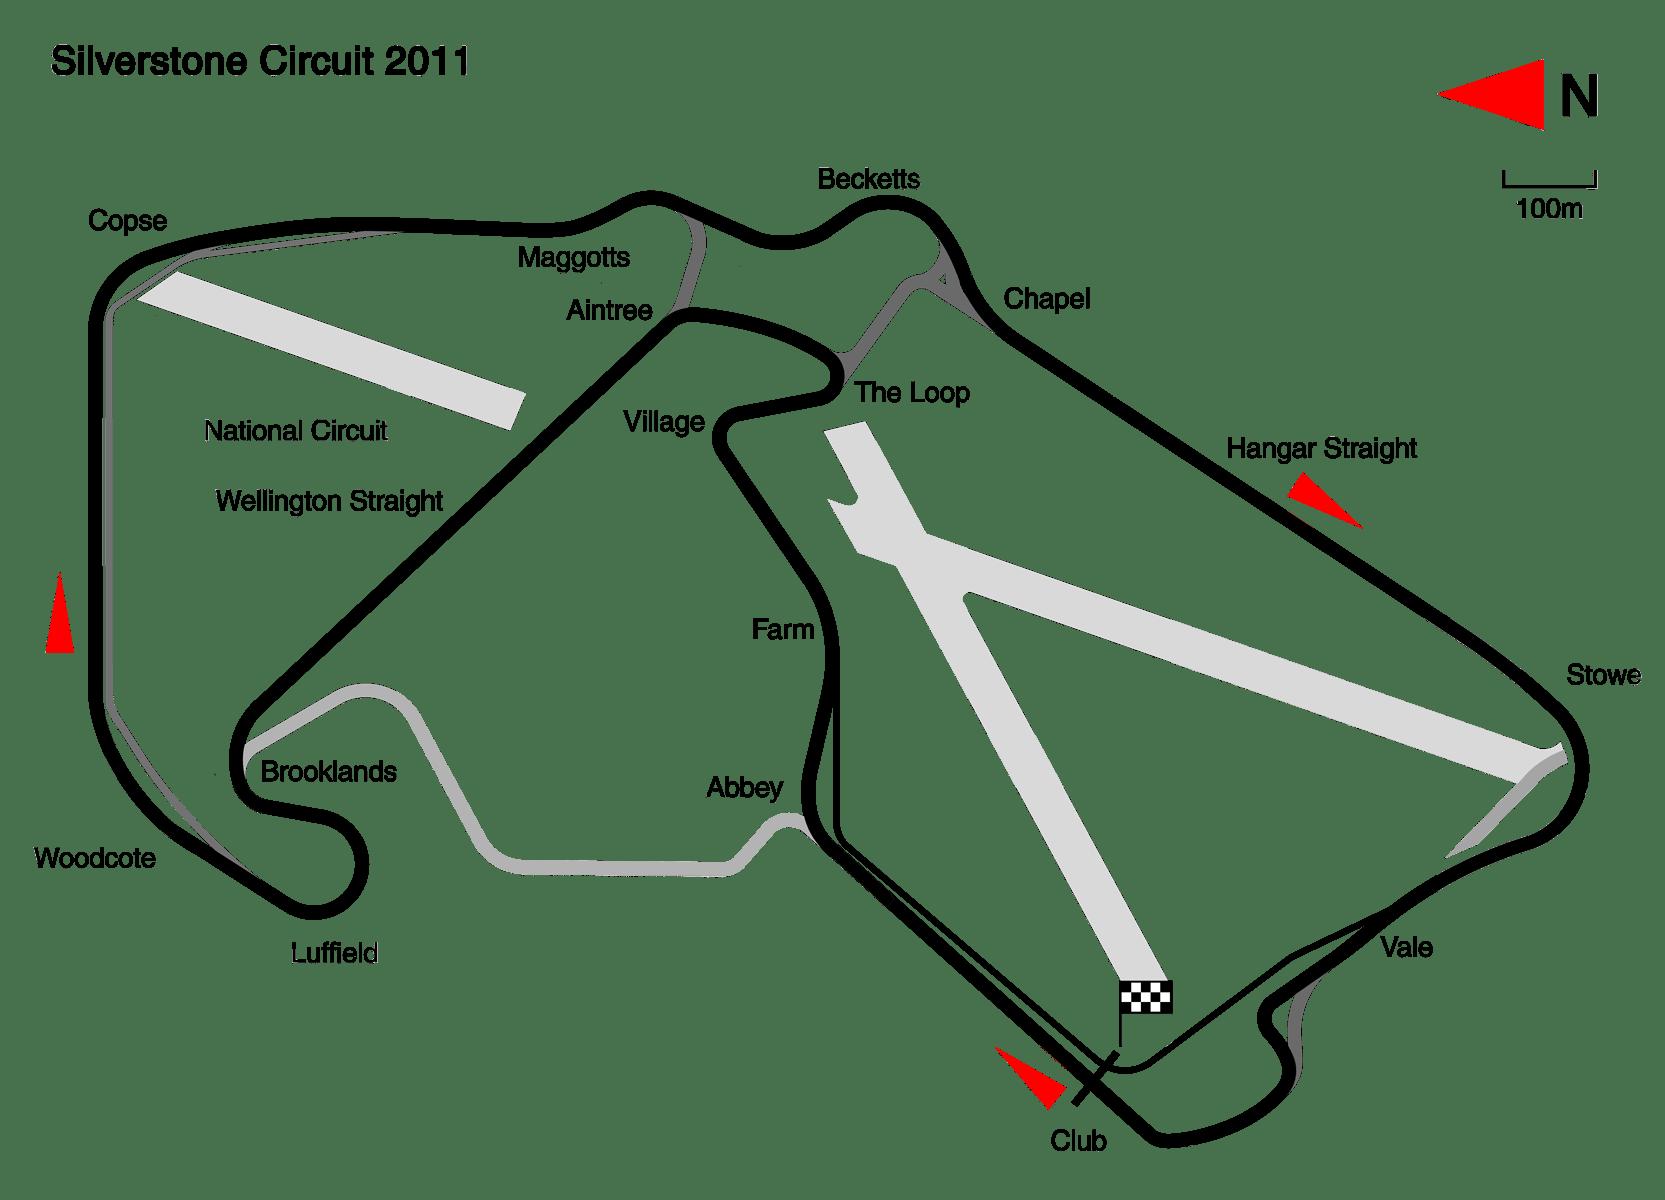 Silverstone Circuit